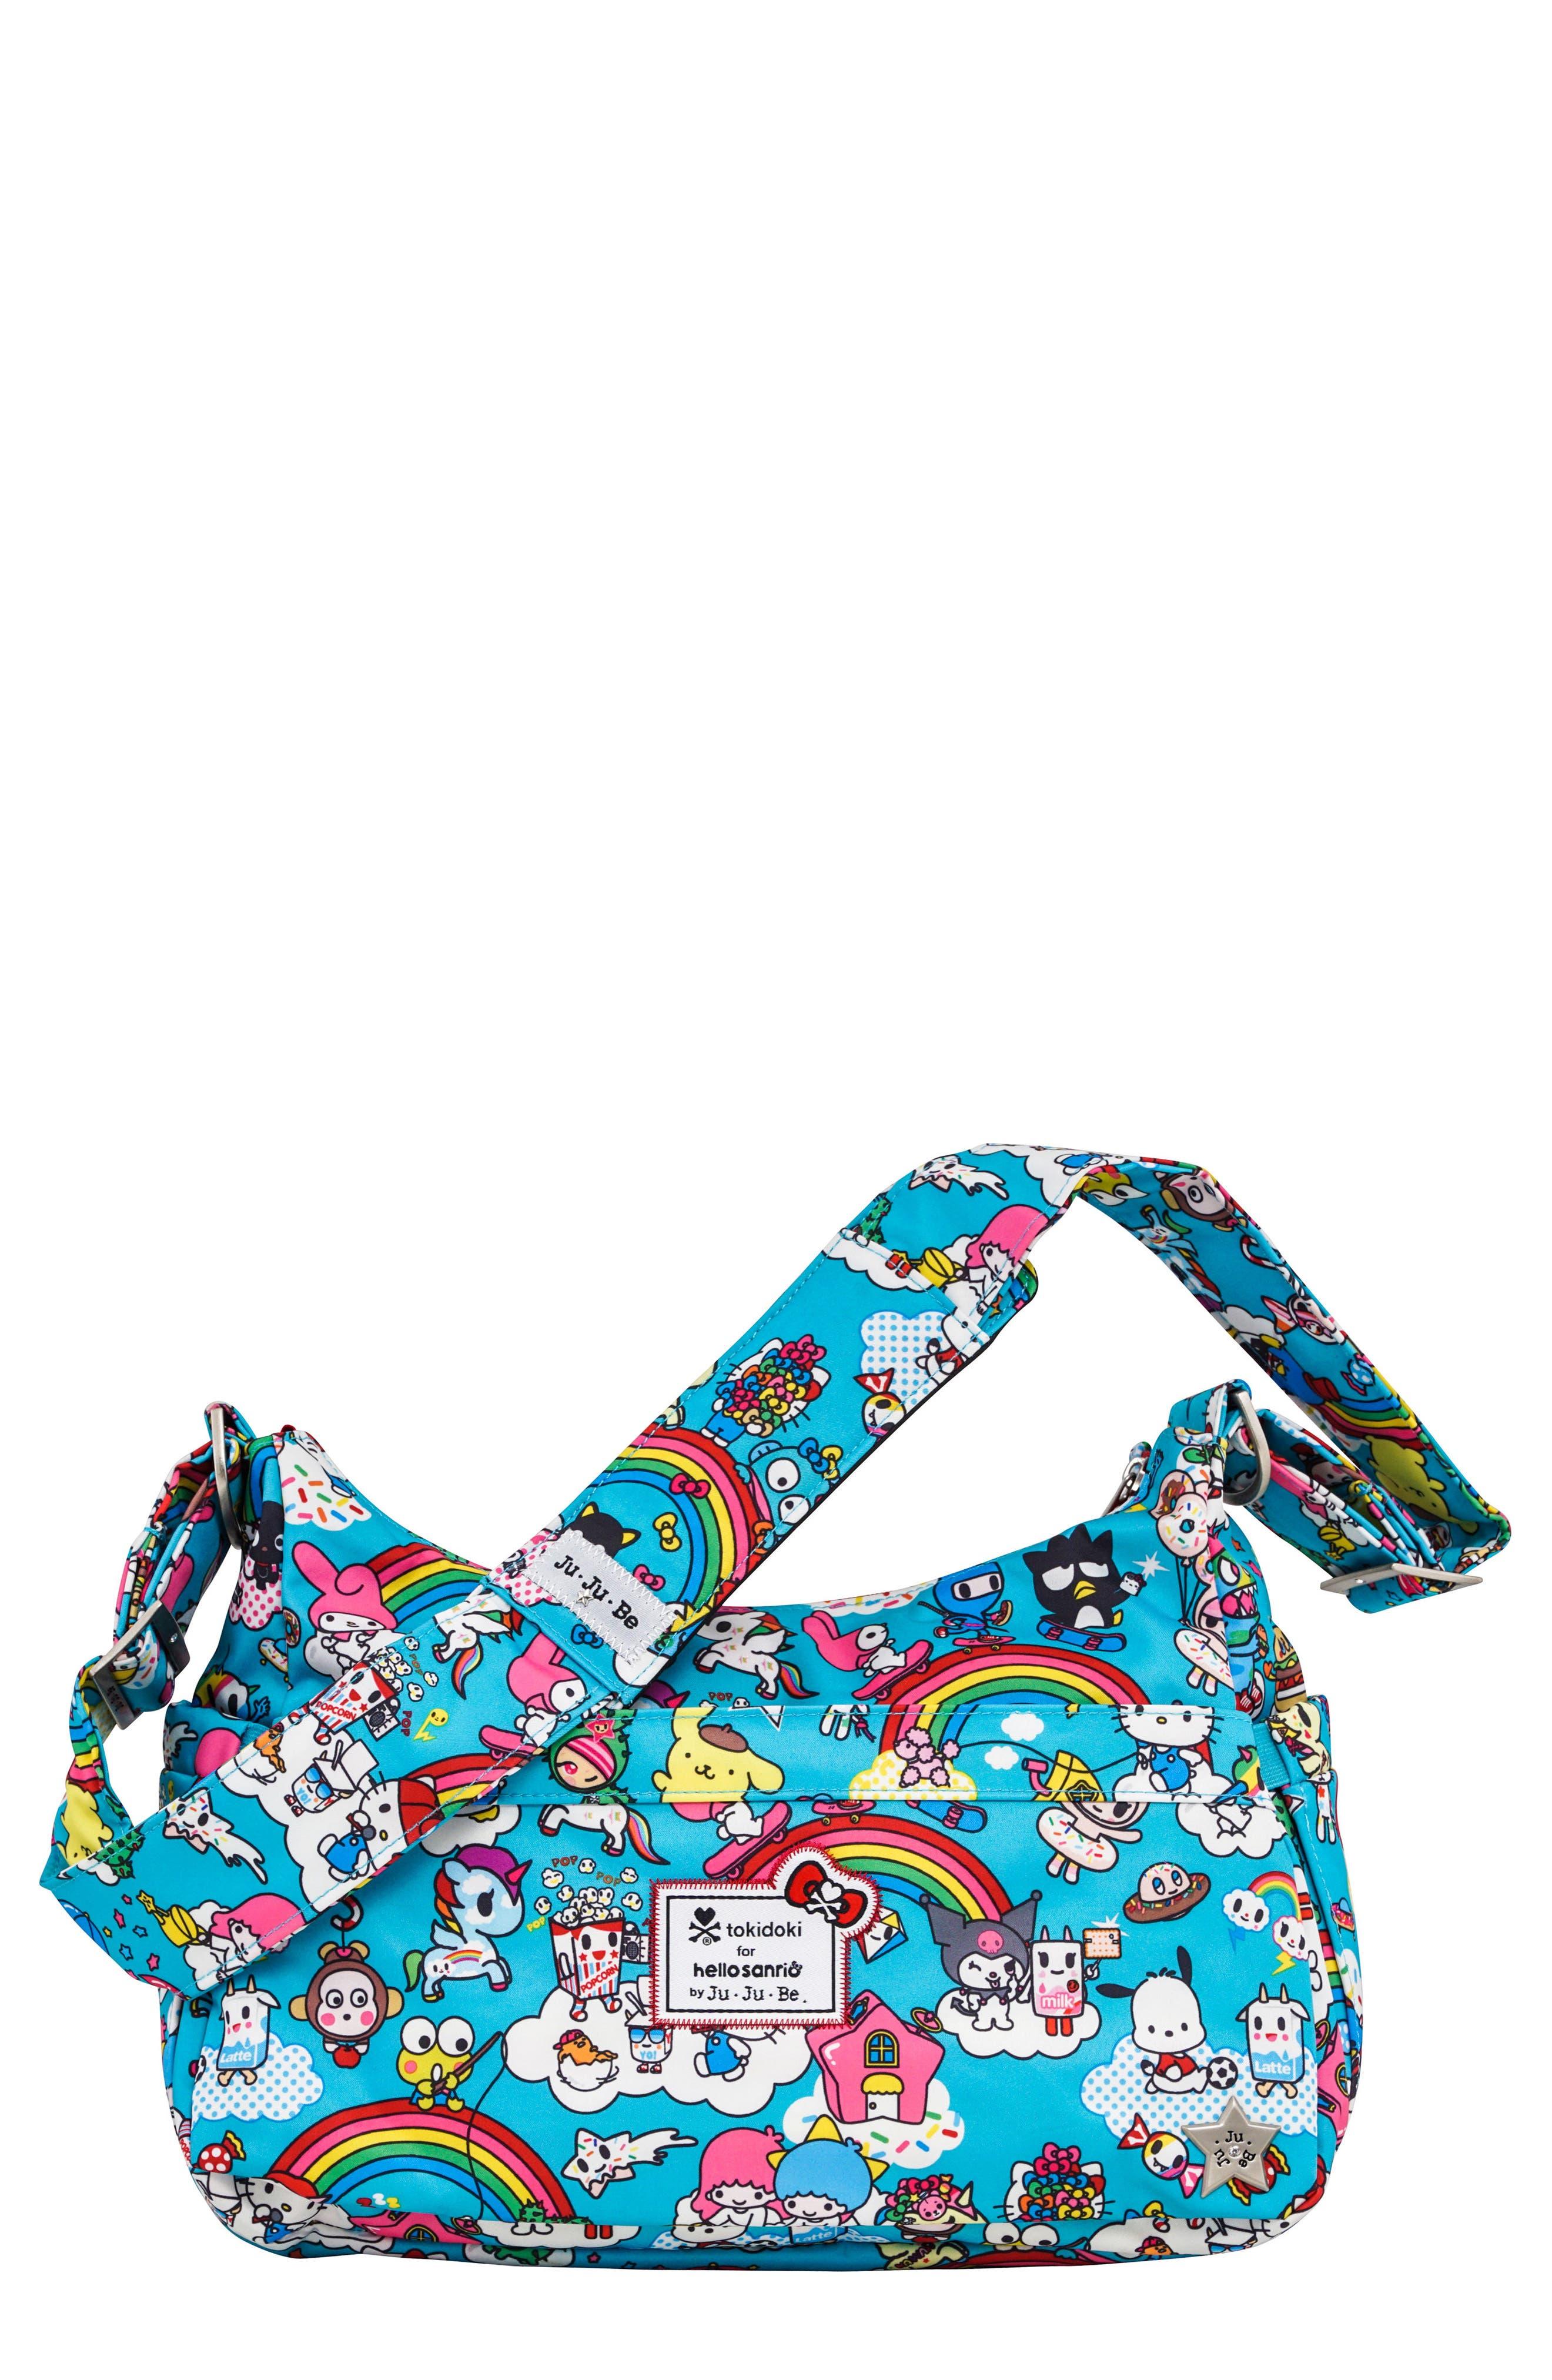 x tokidoki for Hello Sanrio Rainbow Dreams Be Hobo Diaper Bag,                             Main thumbnail 1, color,                             433